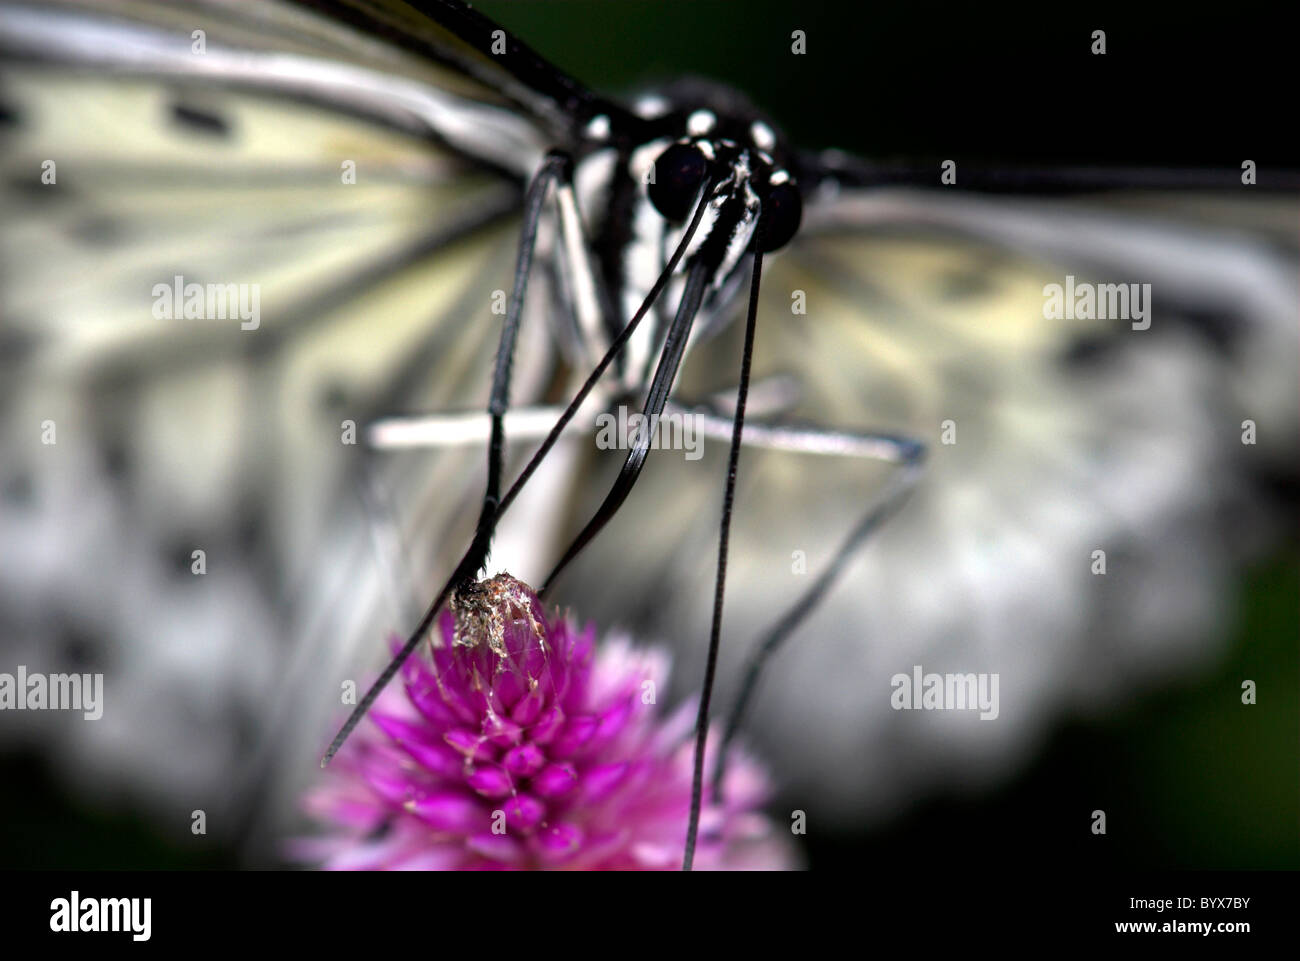 Tree Nymph ButterflyIdea leuconoe Asia Immagini Stock